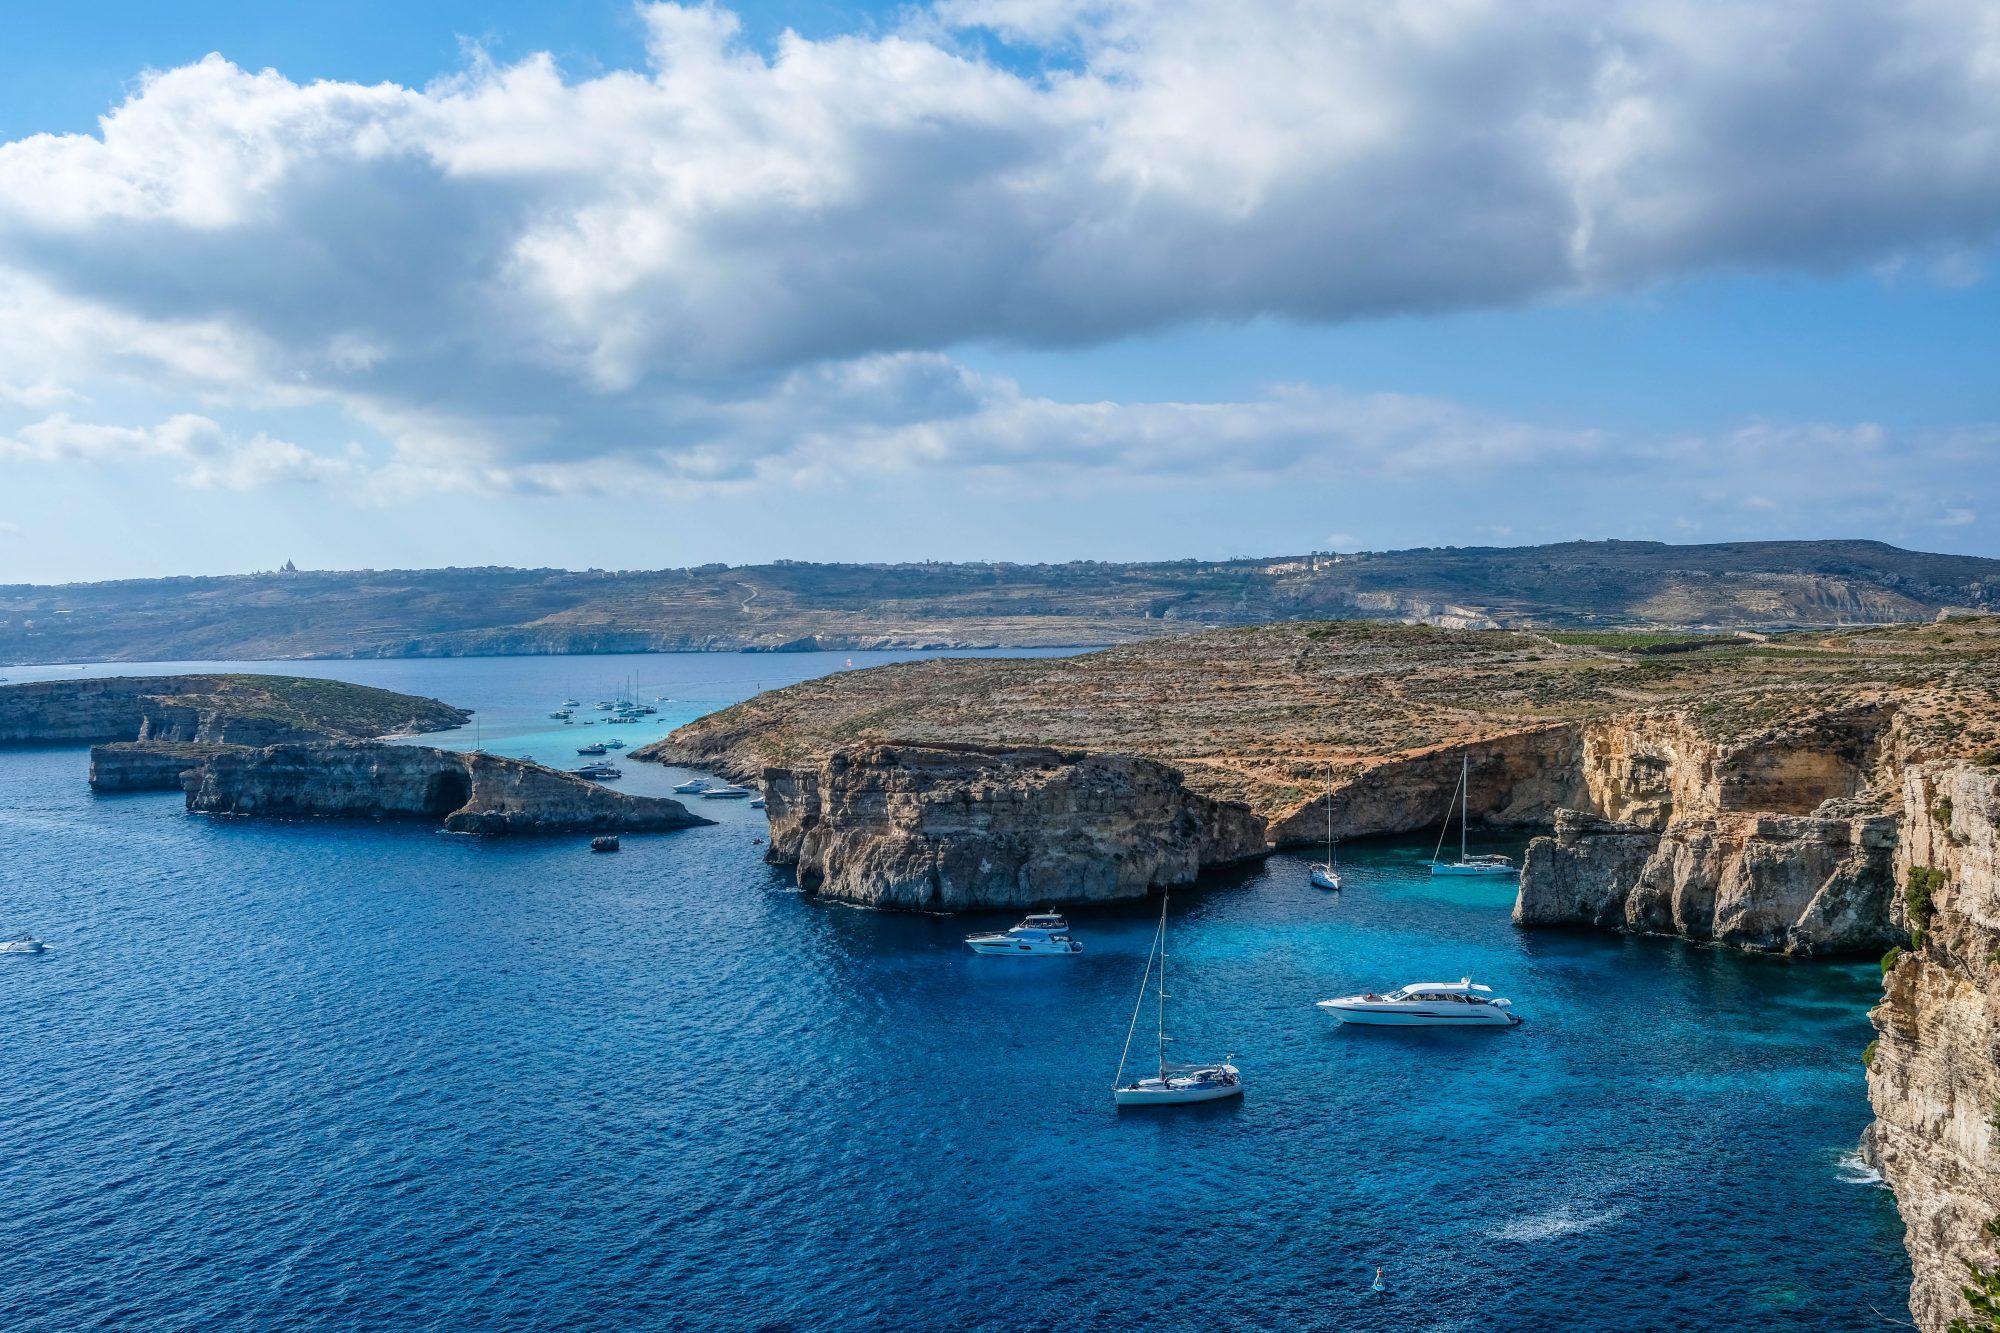 Blue Lagoon et Gozo en fond - Malte